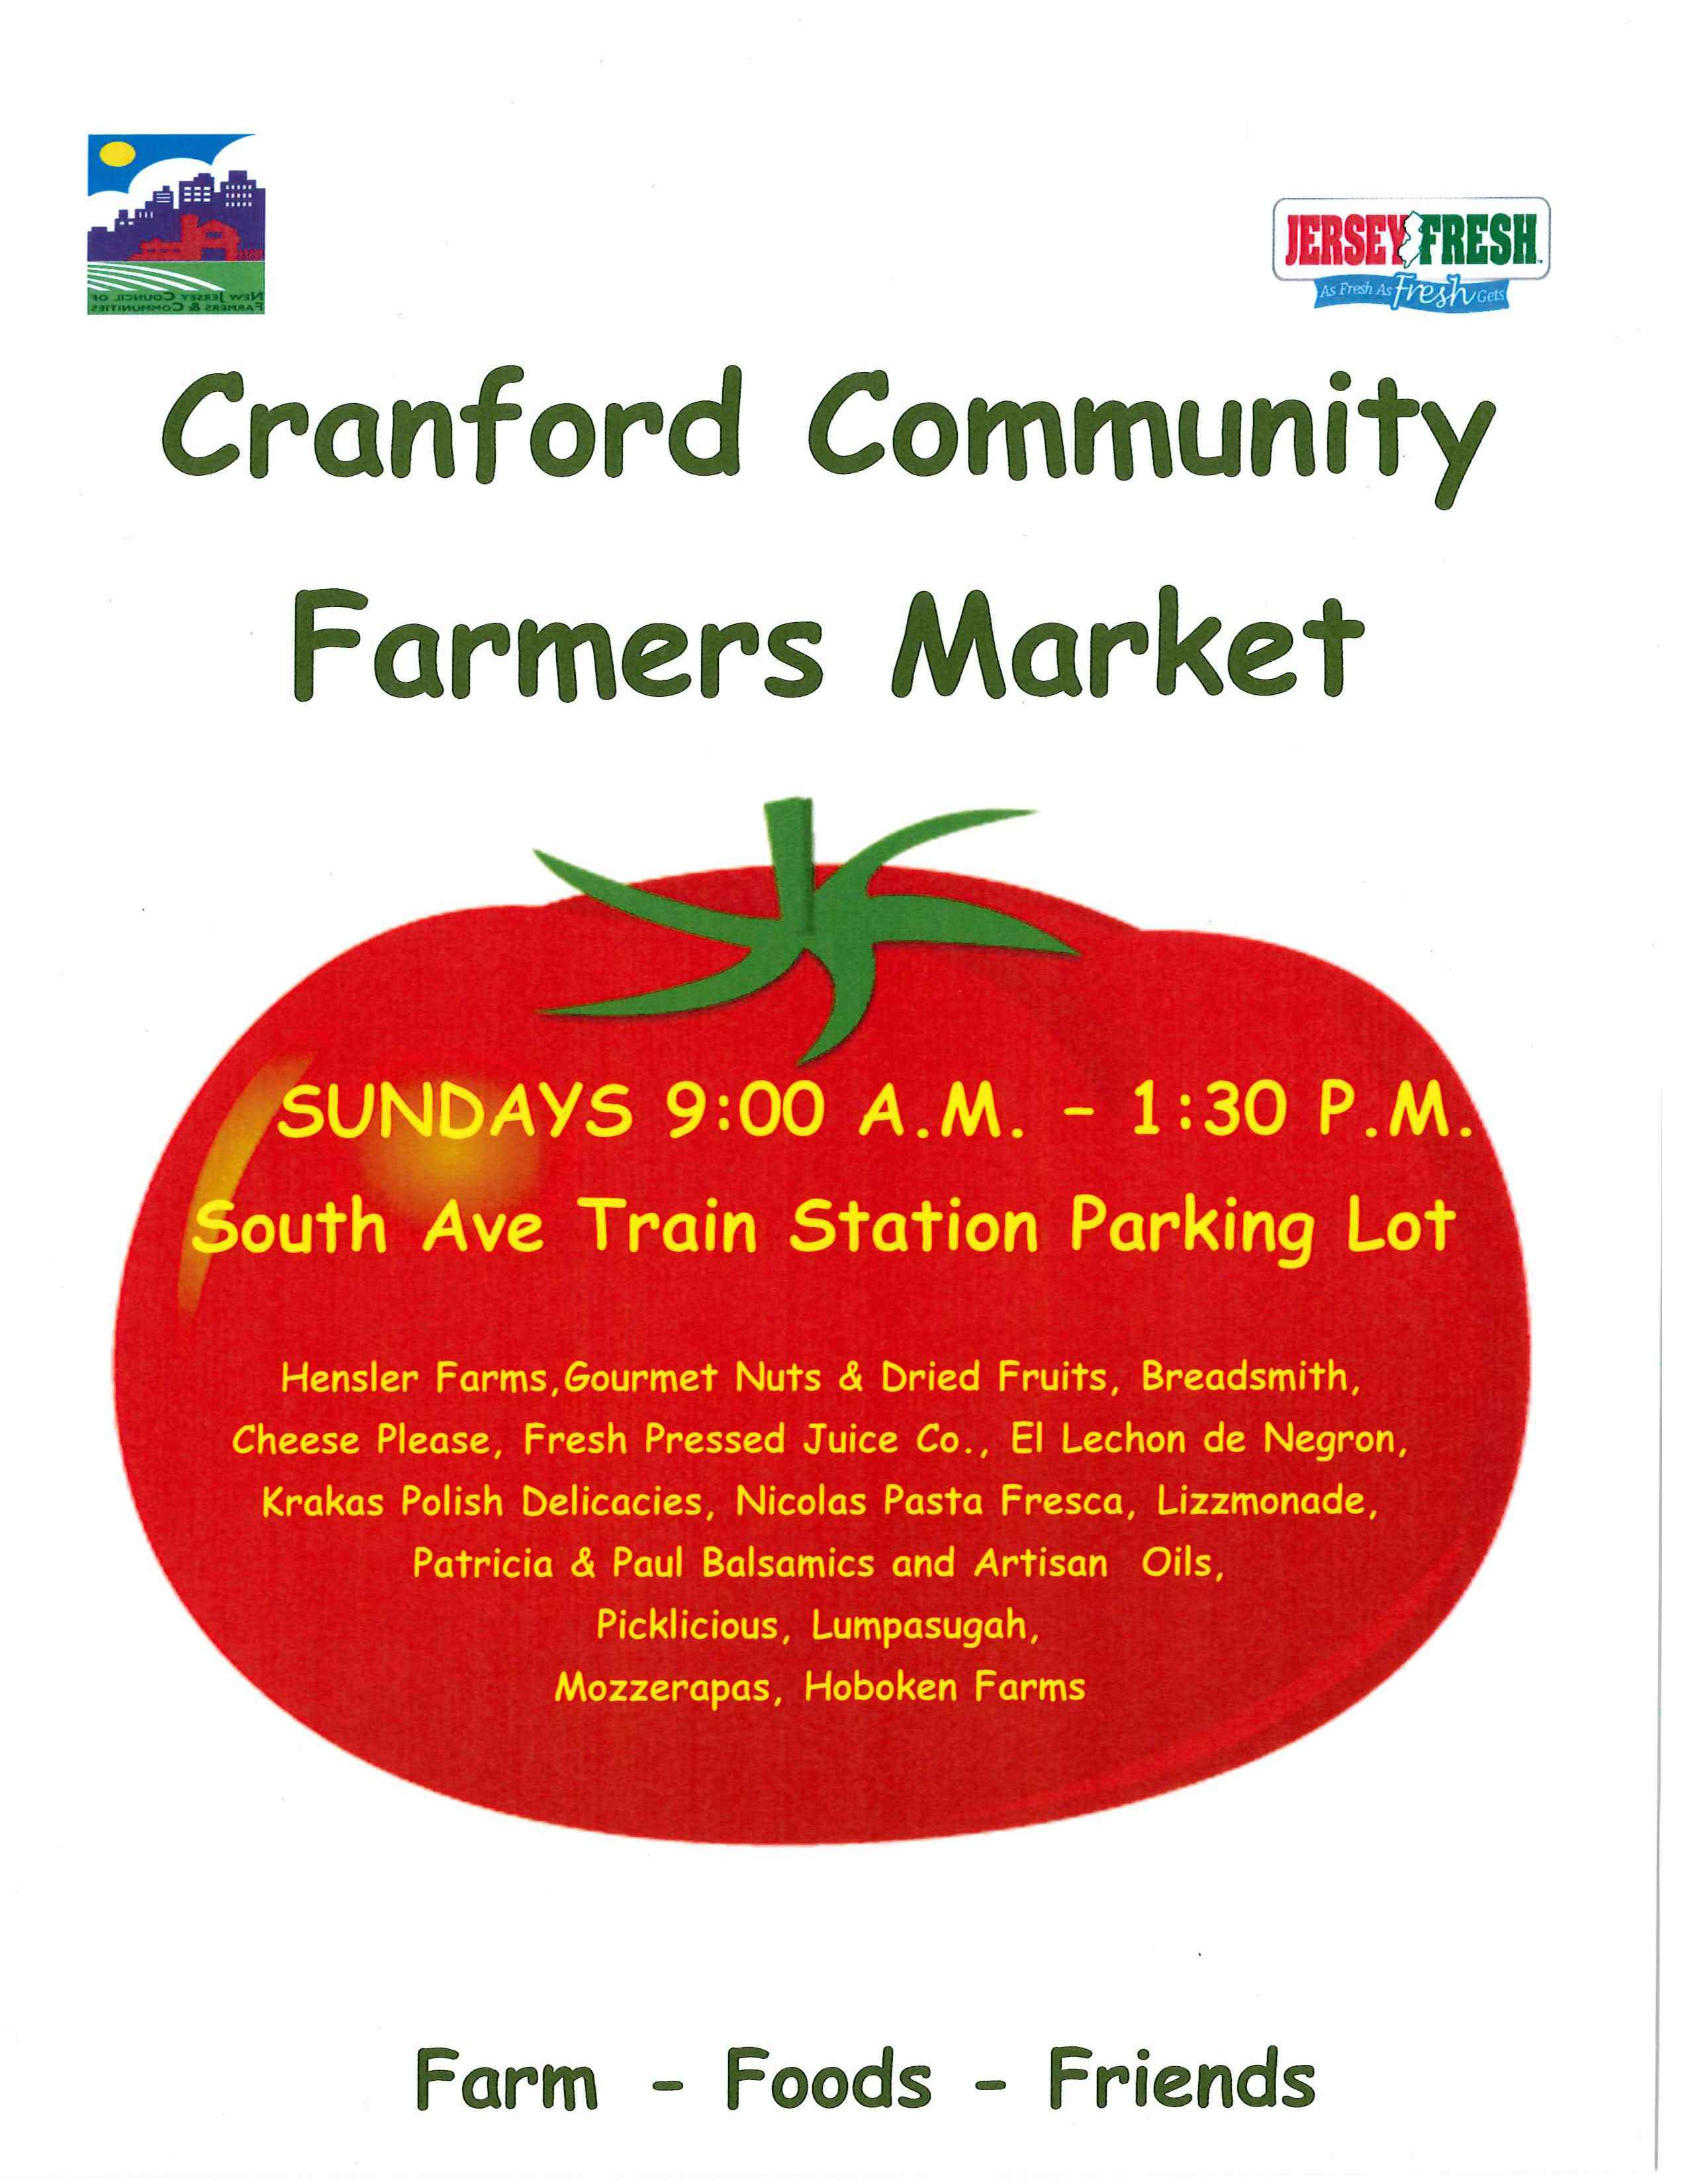 f139e6a12a8d3620c705_Cranford_Farmers_Market__1_.jpg